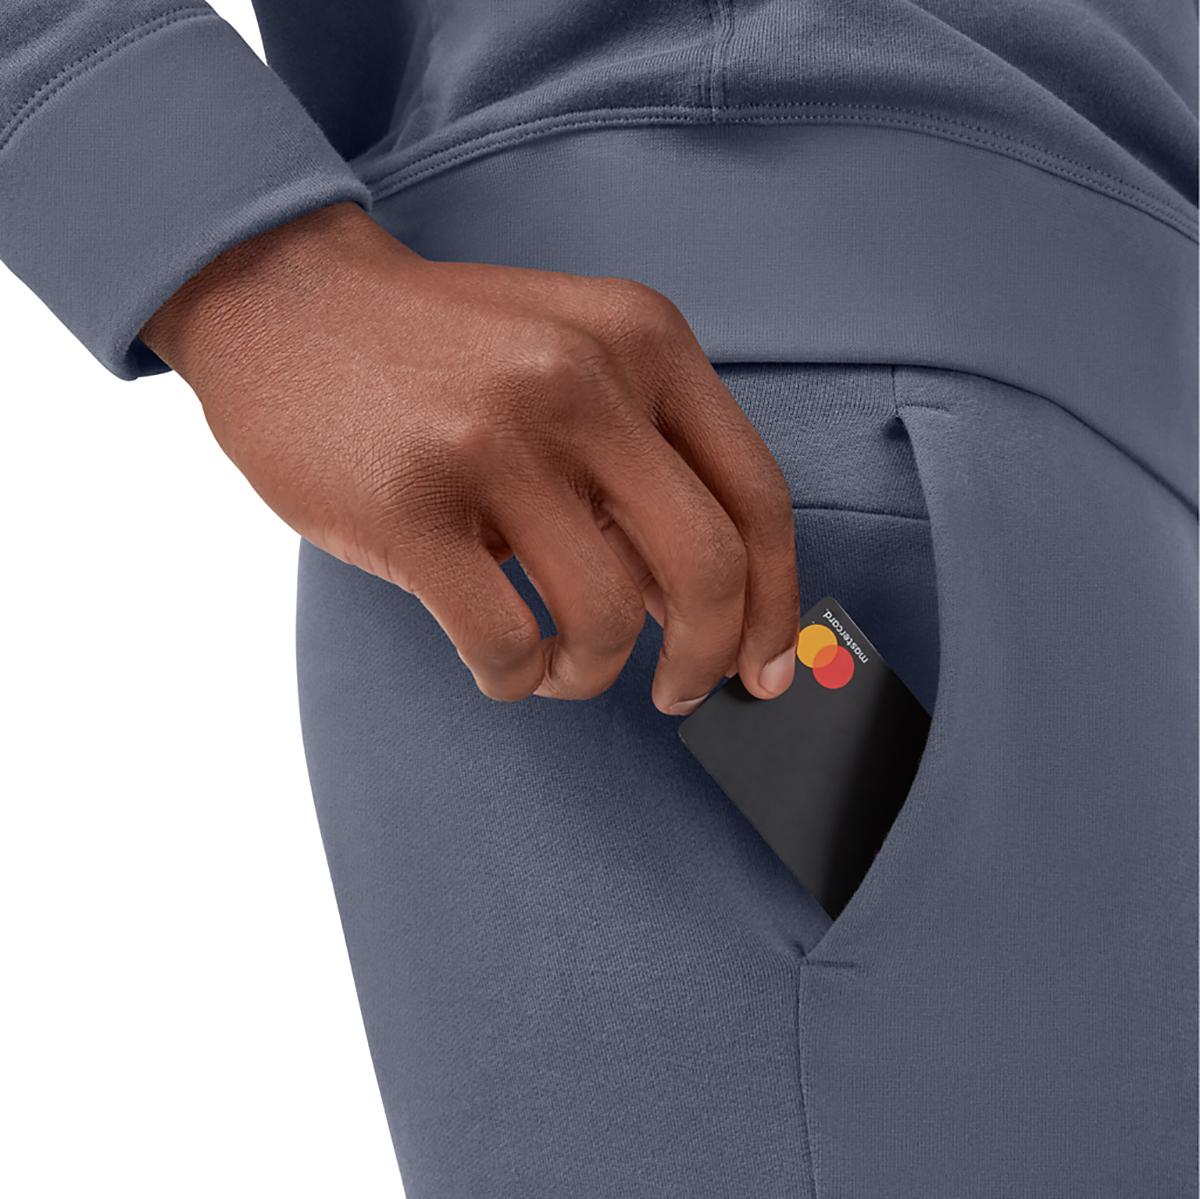 Men's On Sweat Shorts - Color: Dark - Size: S, Dark, large, image 3